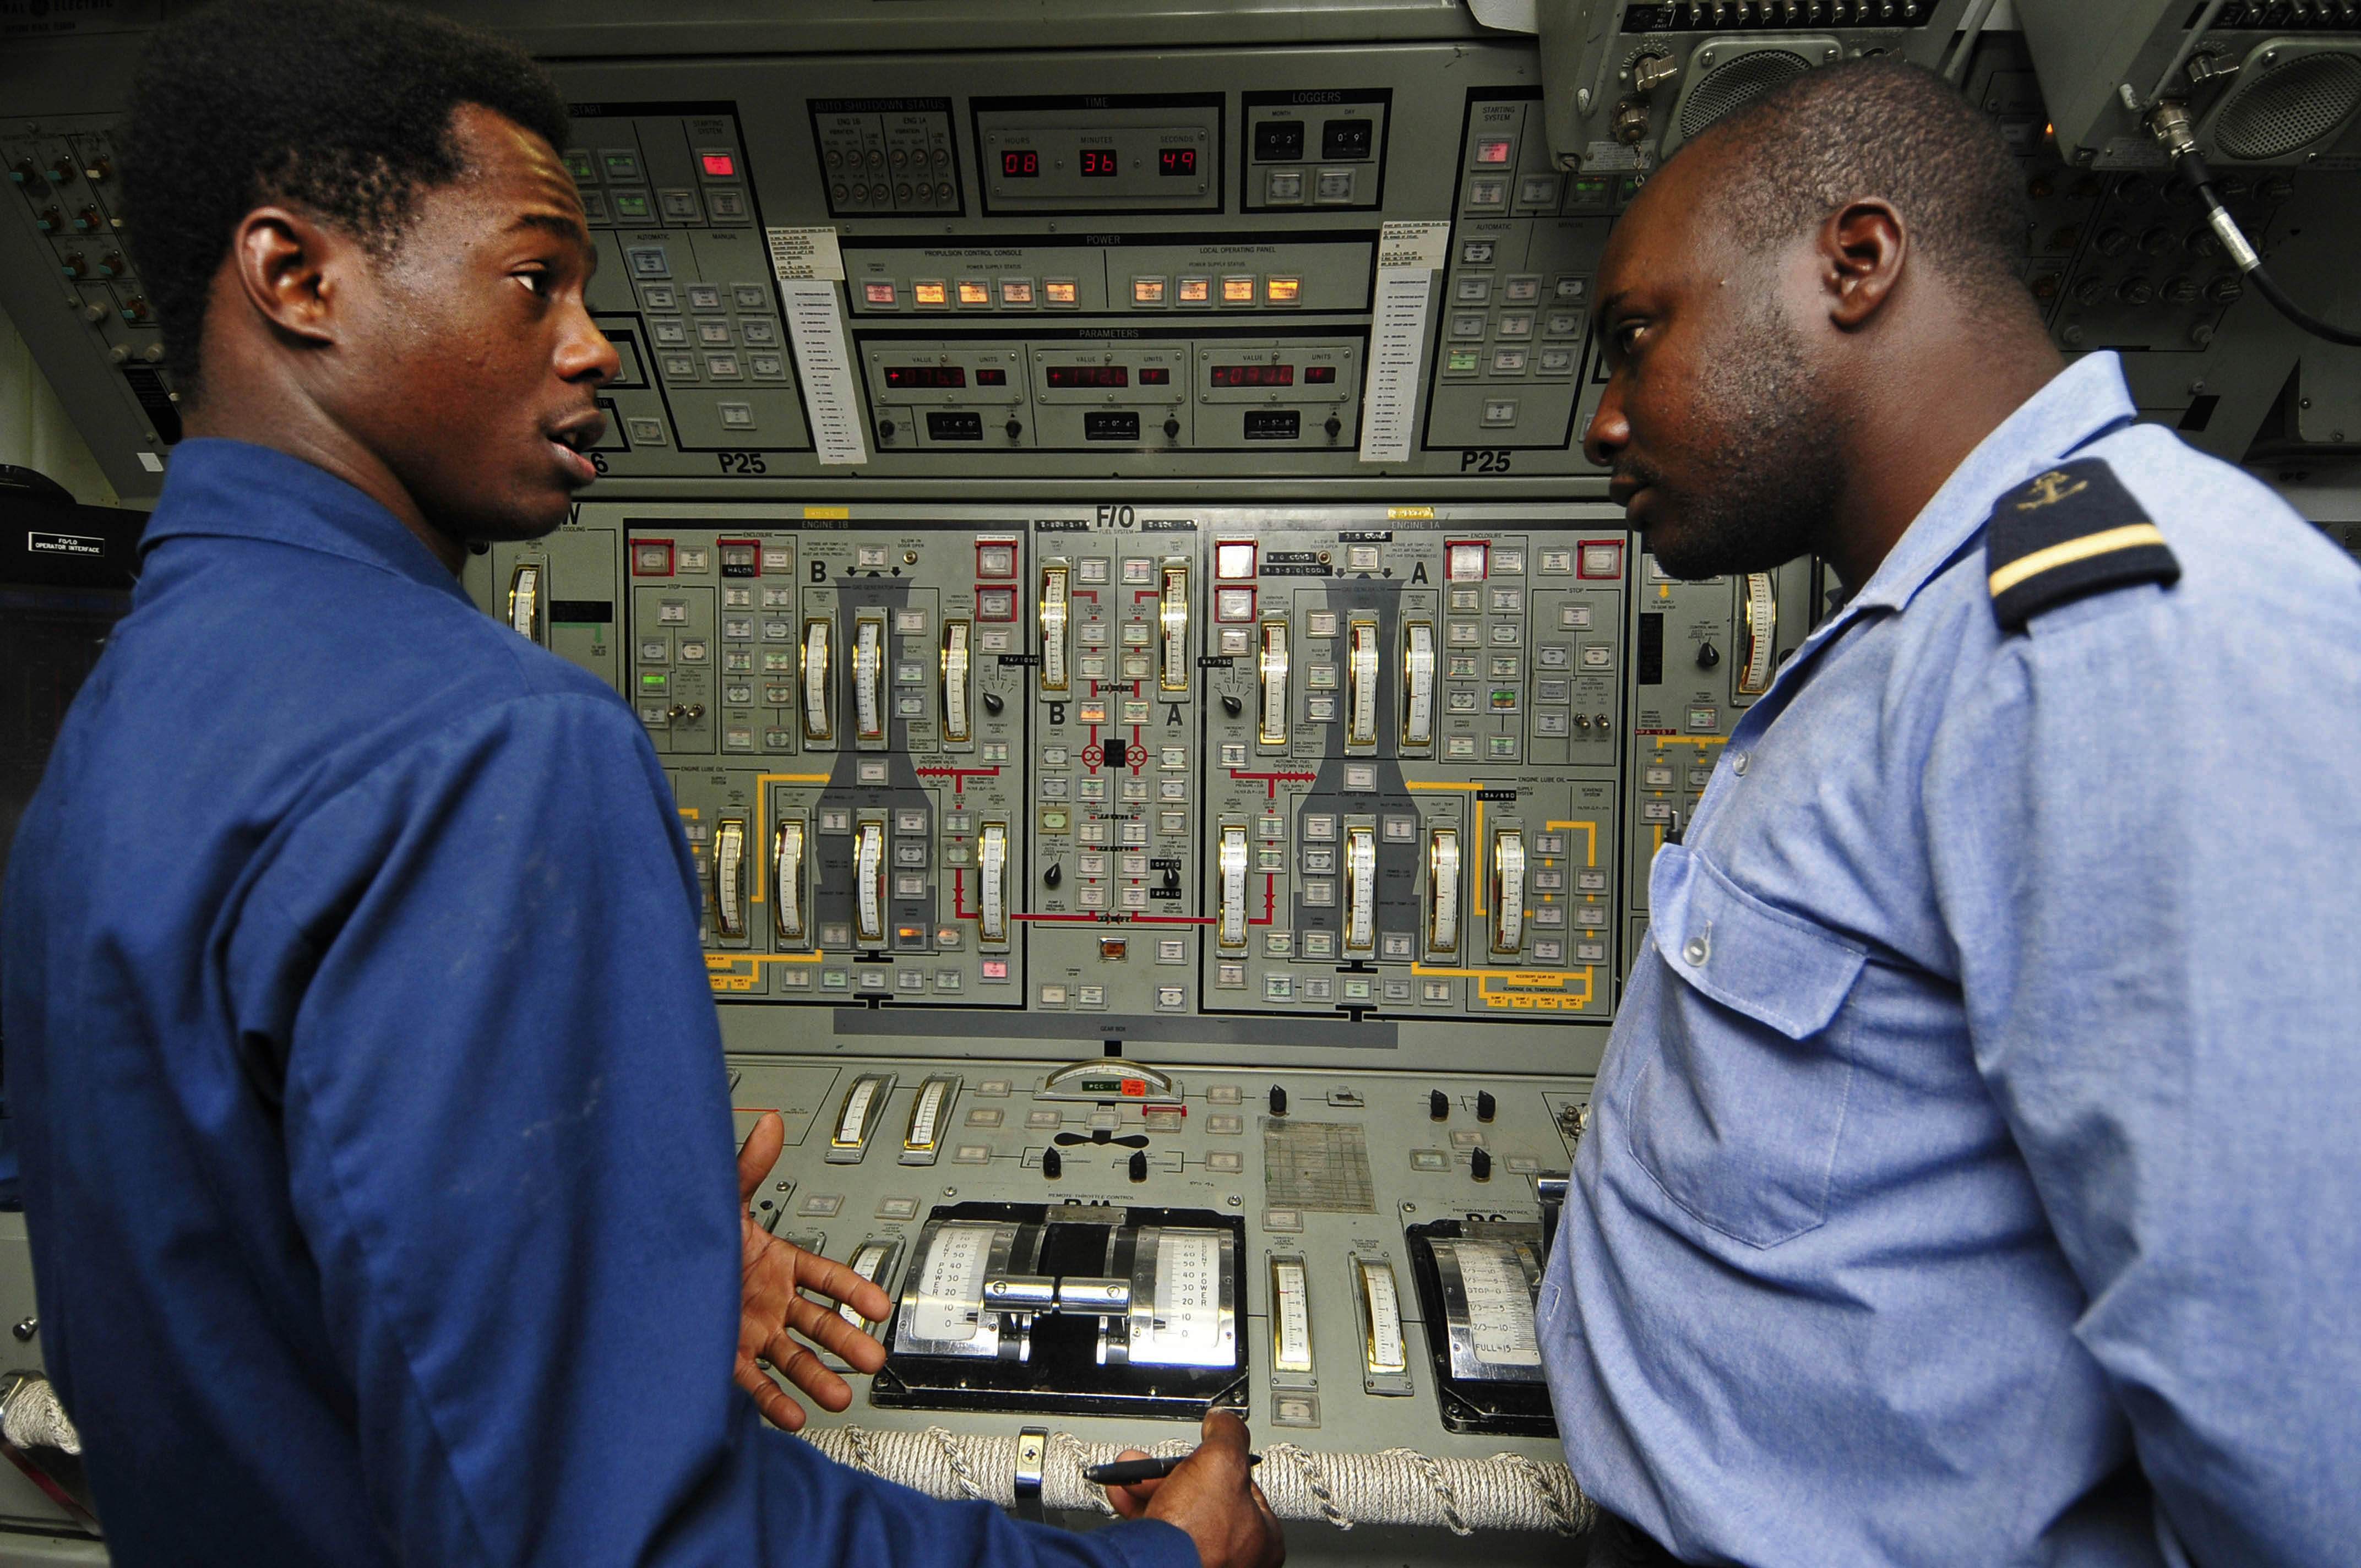 U S Navy Gas Turbine System Technician Mechanical 3rd Class Botha